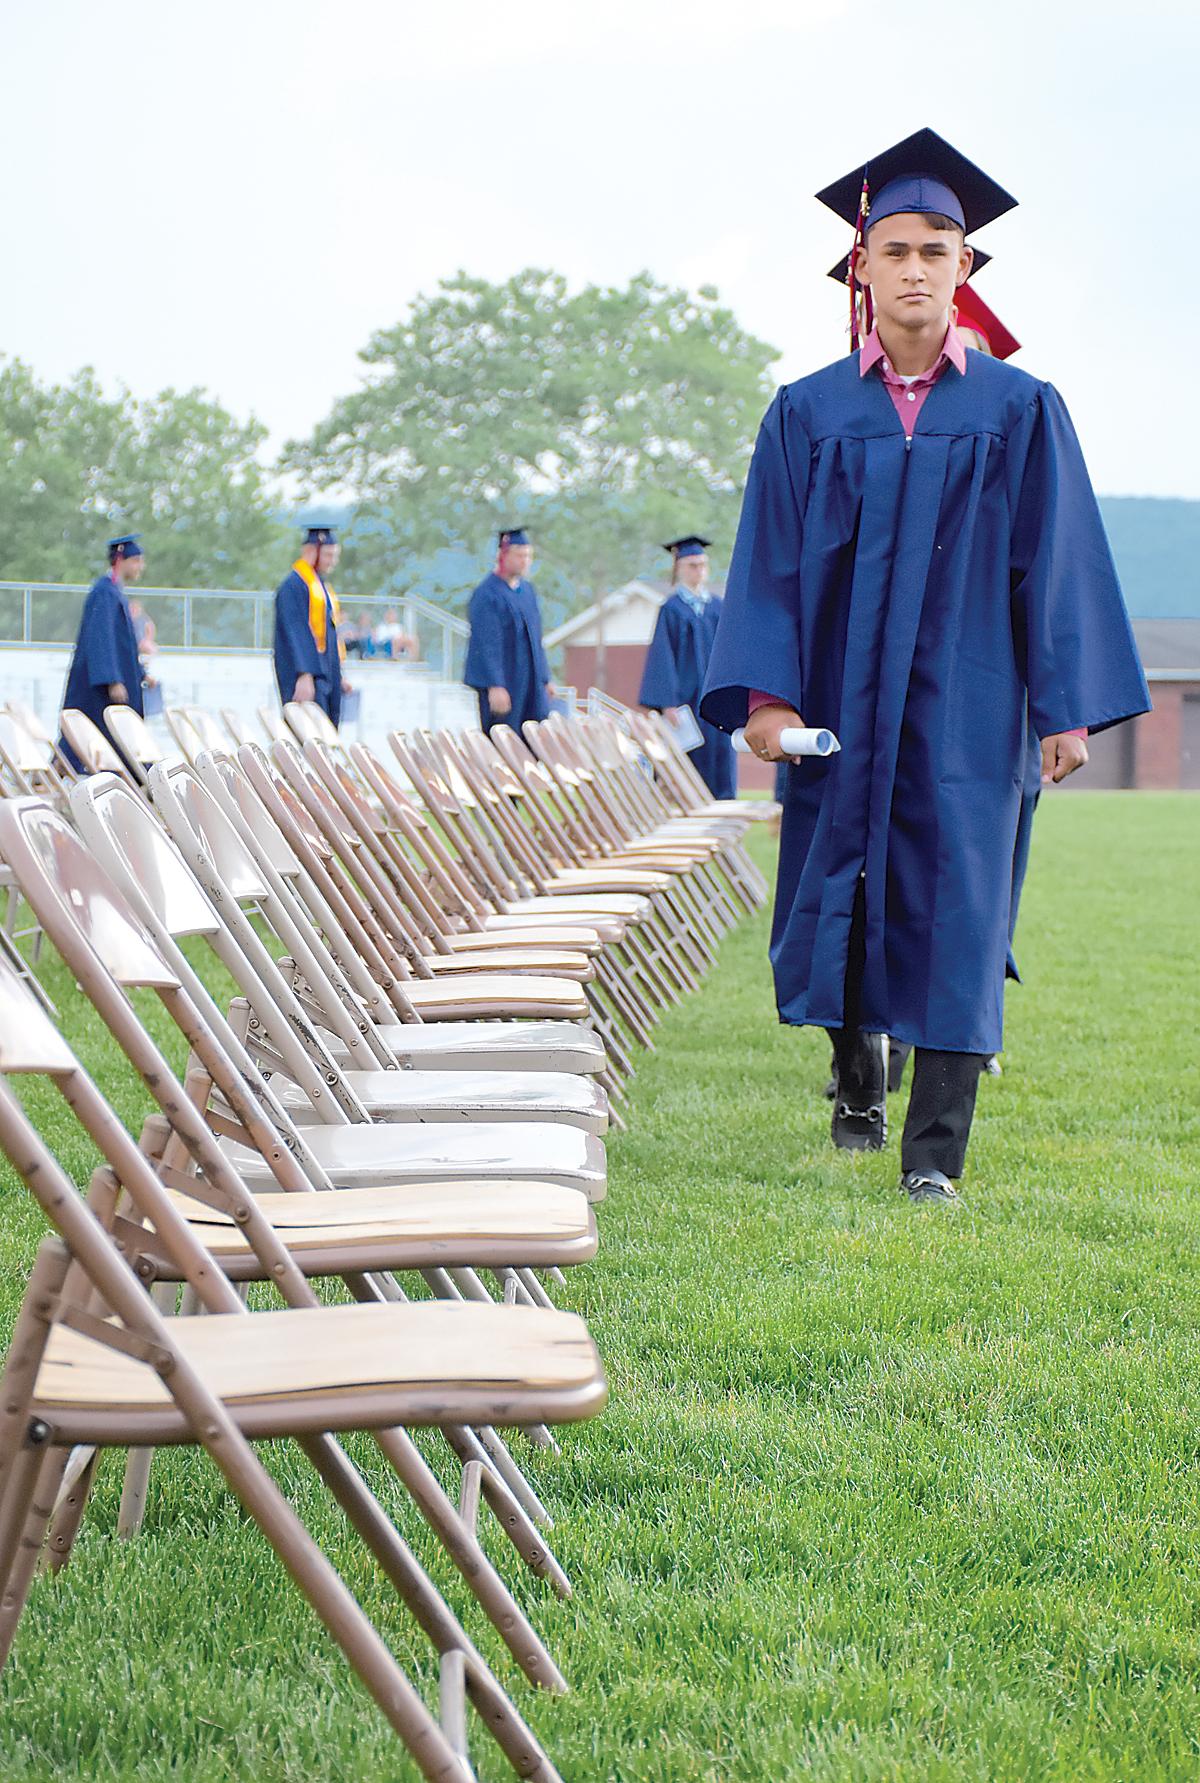 2018 Graduations | News, Sports, Jobs - The Sentinel With Mifflin County School Graduation